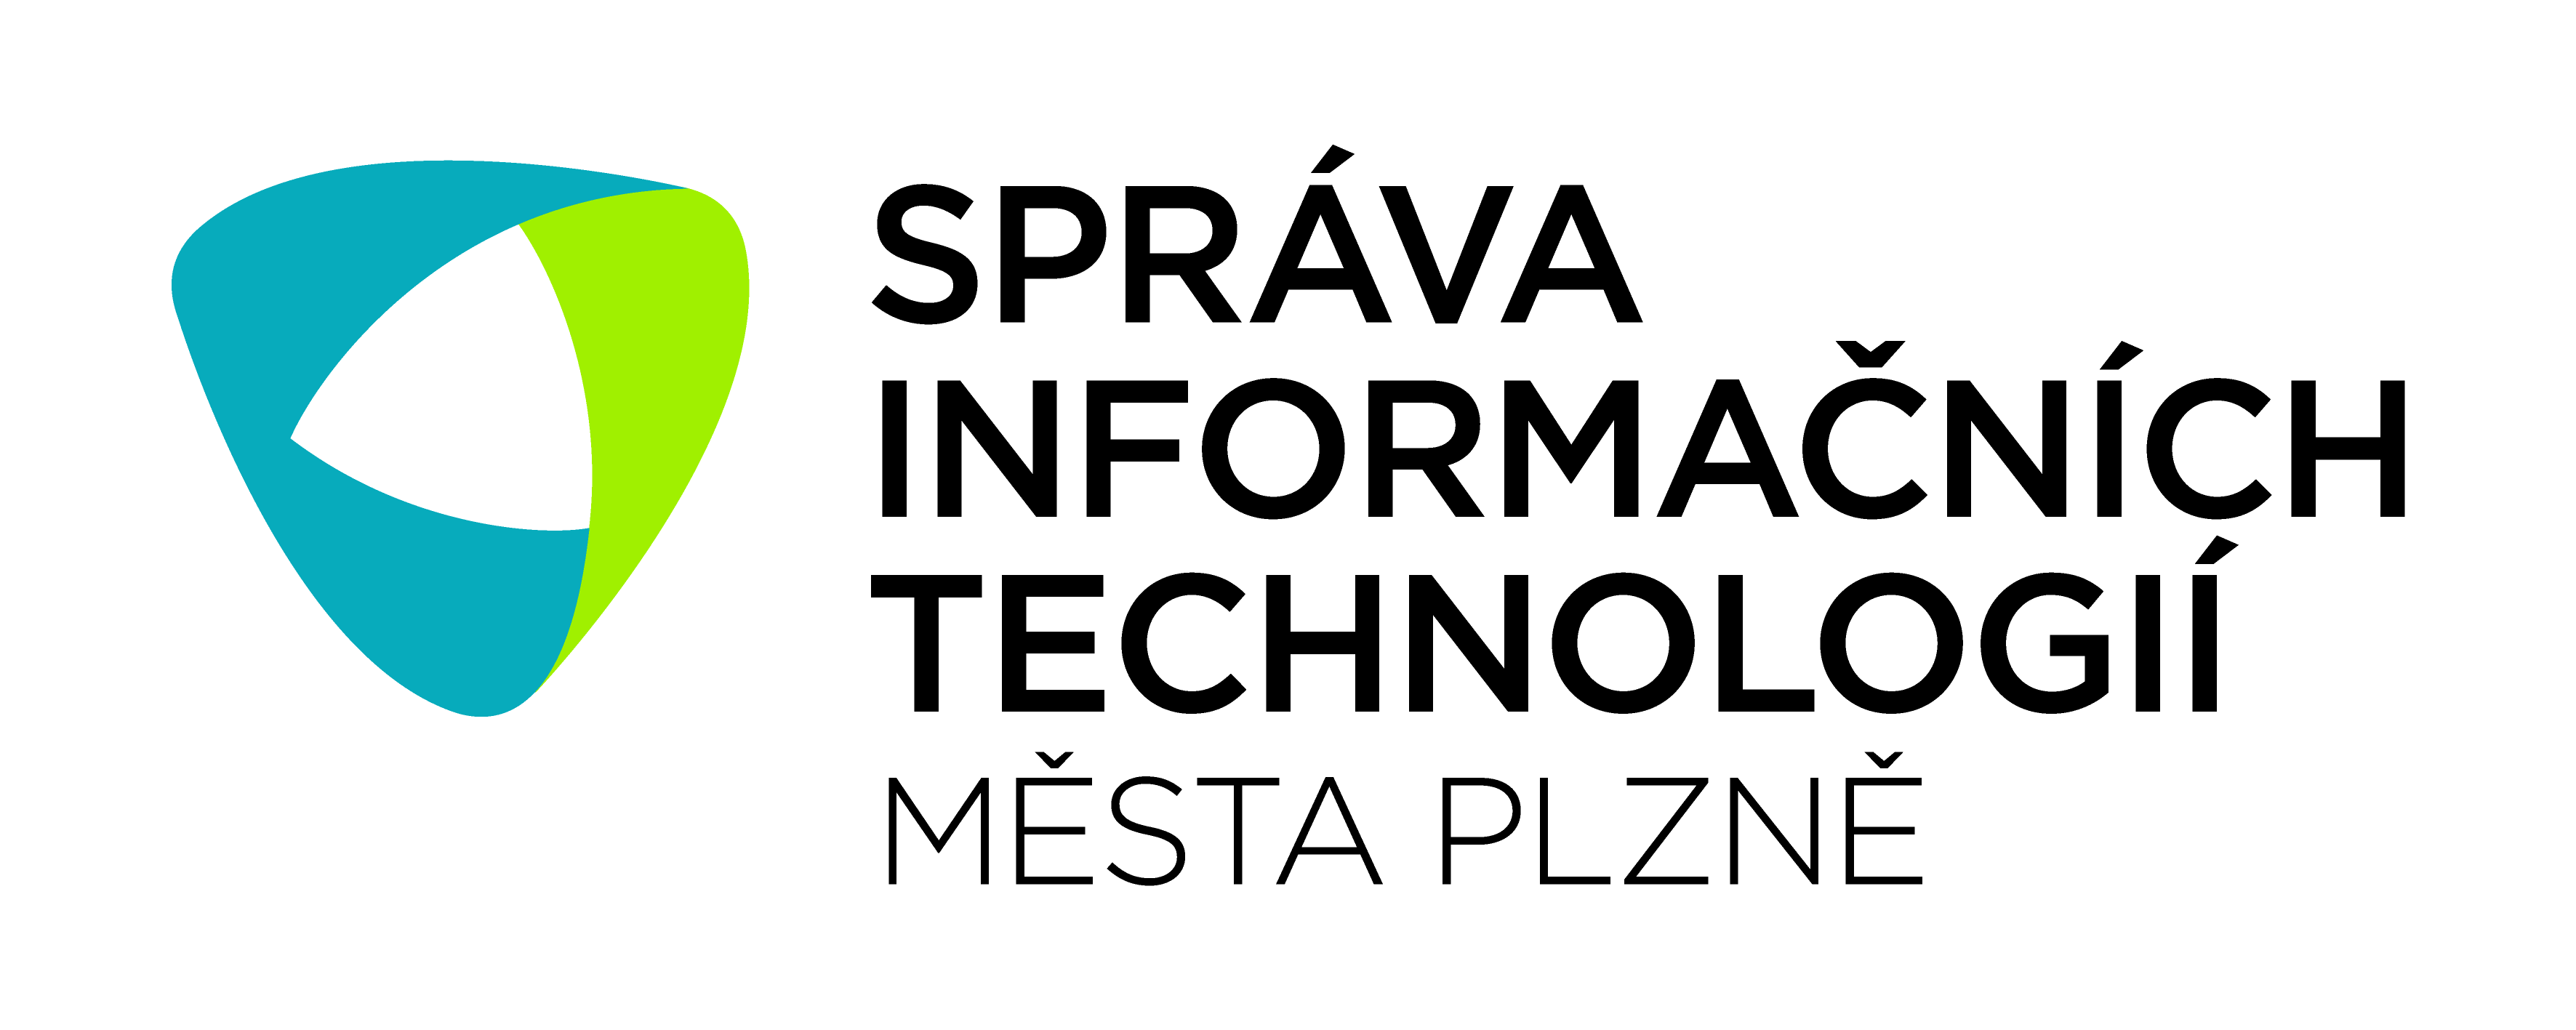 bm_sitmp_logo_color_transparent_rgb